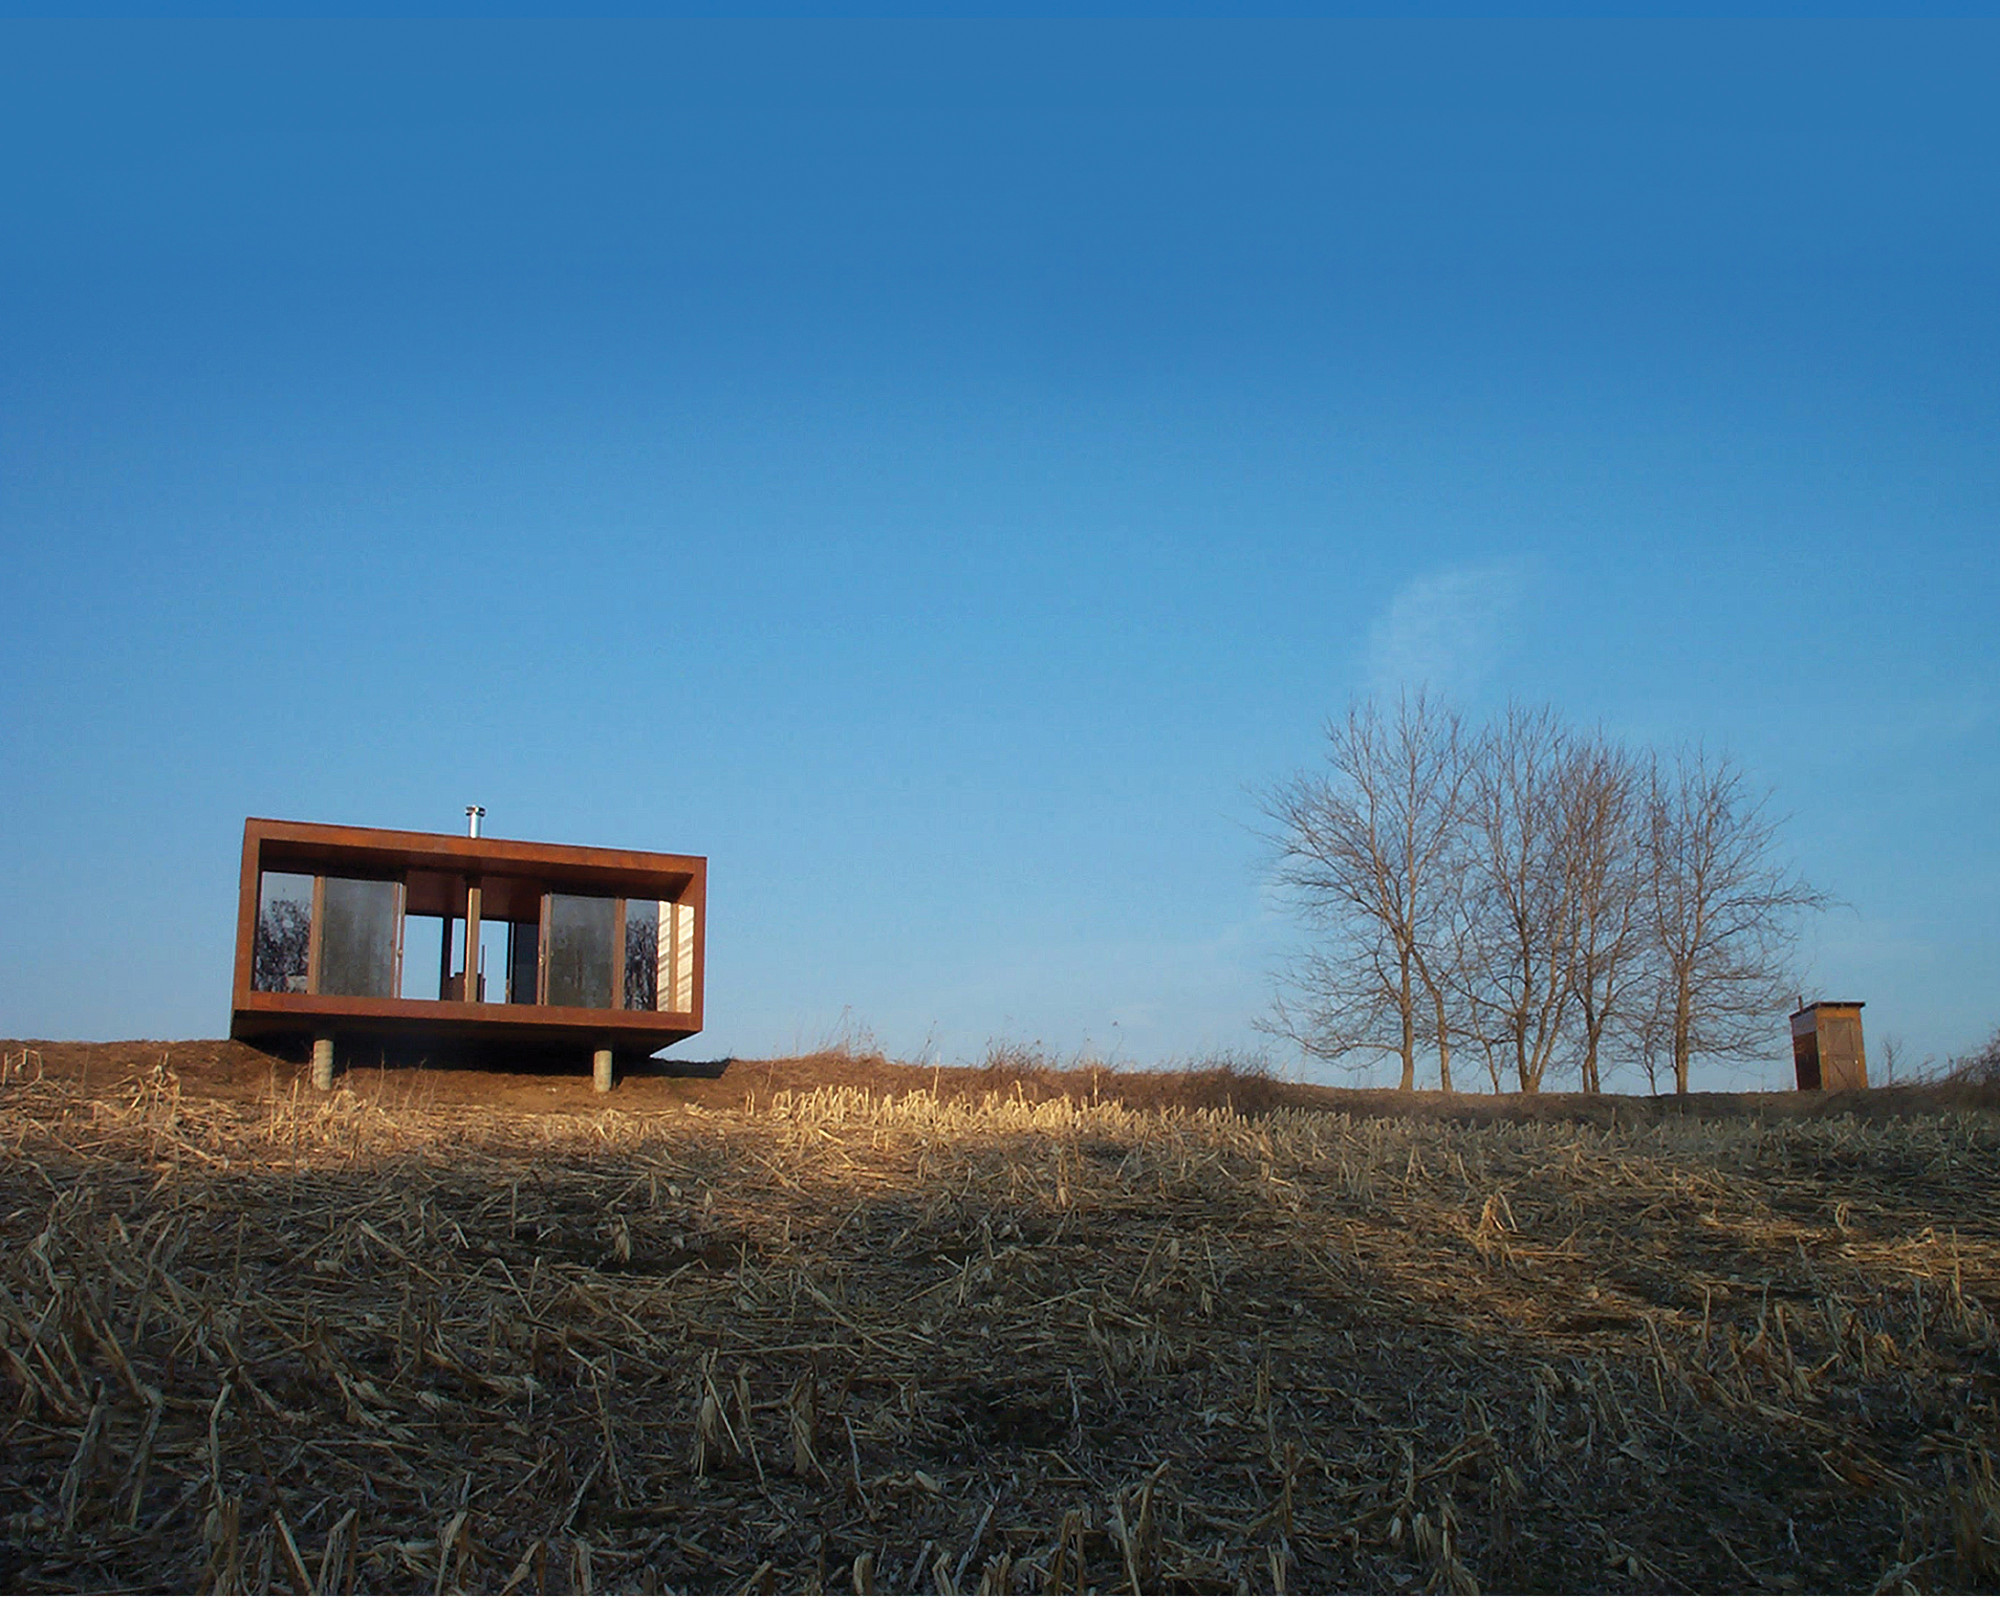 Arado weeHouse / Alchemy Architects, Courtesy of Alchemy Architects